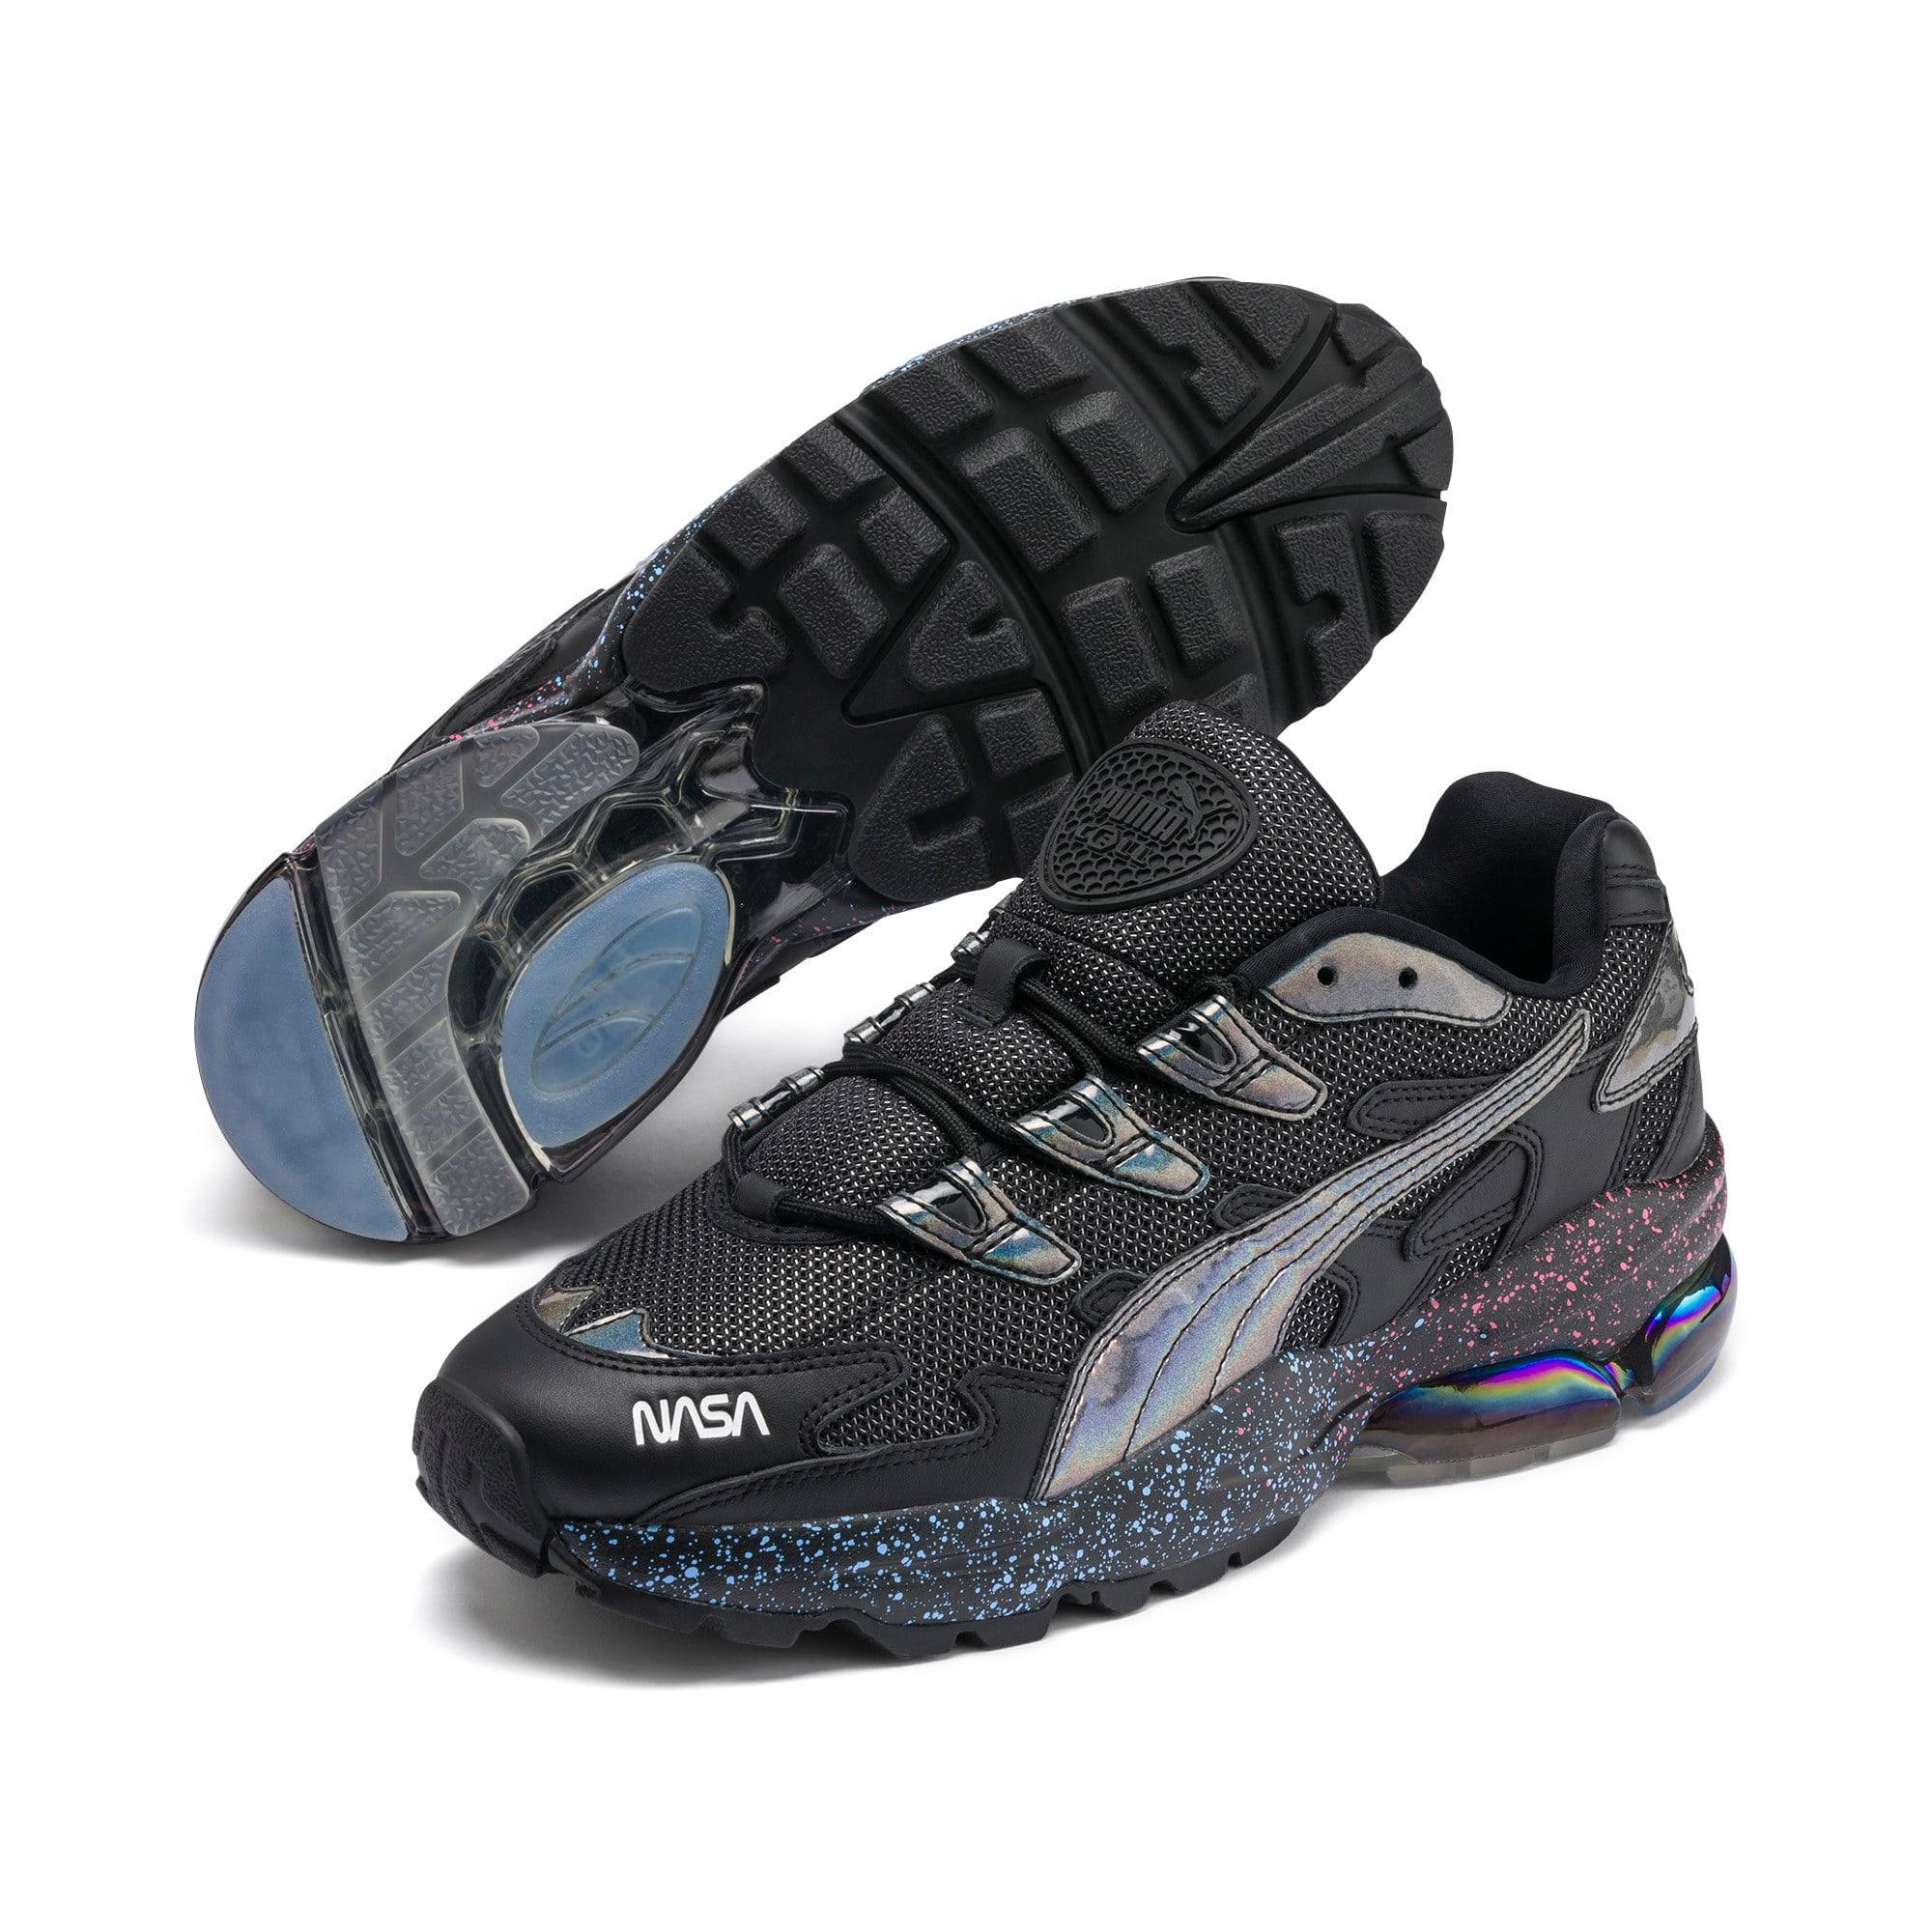 Thumbnail 2 of CELL Alien X Space Agency Sneakers, Puma Black-Puma Black, medium